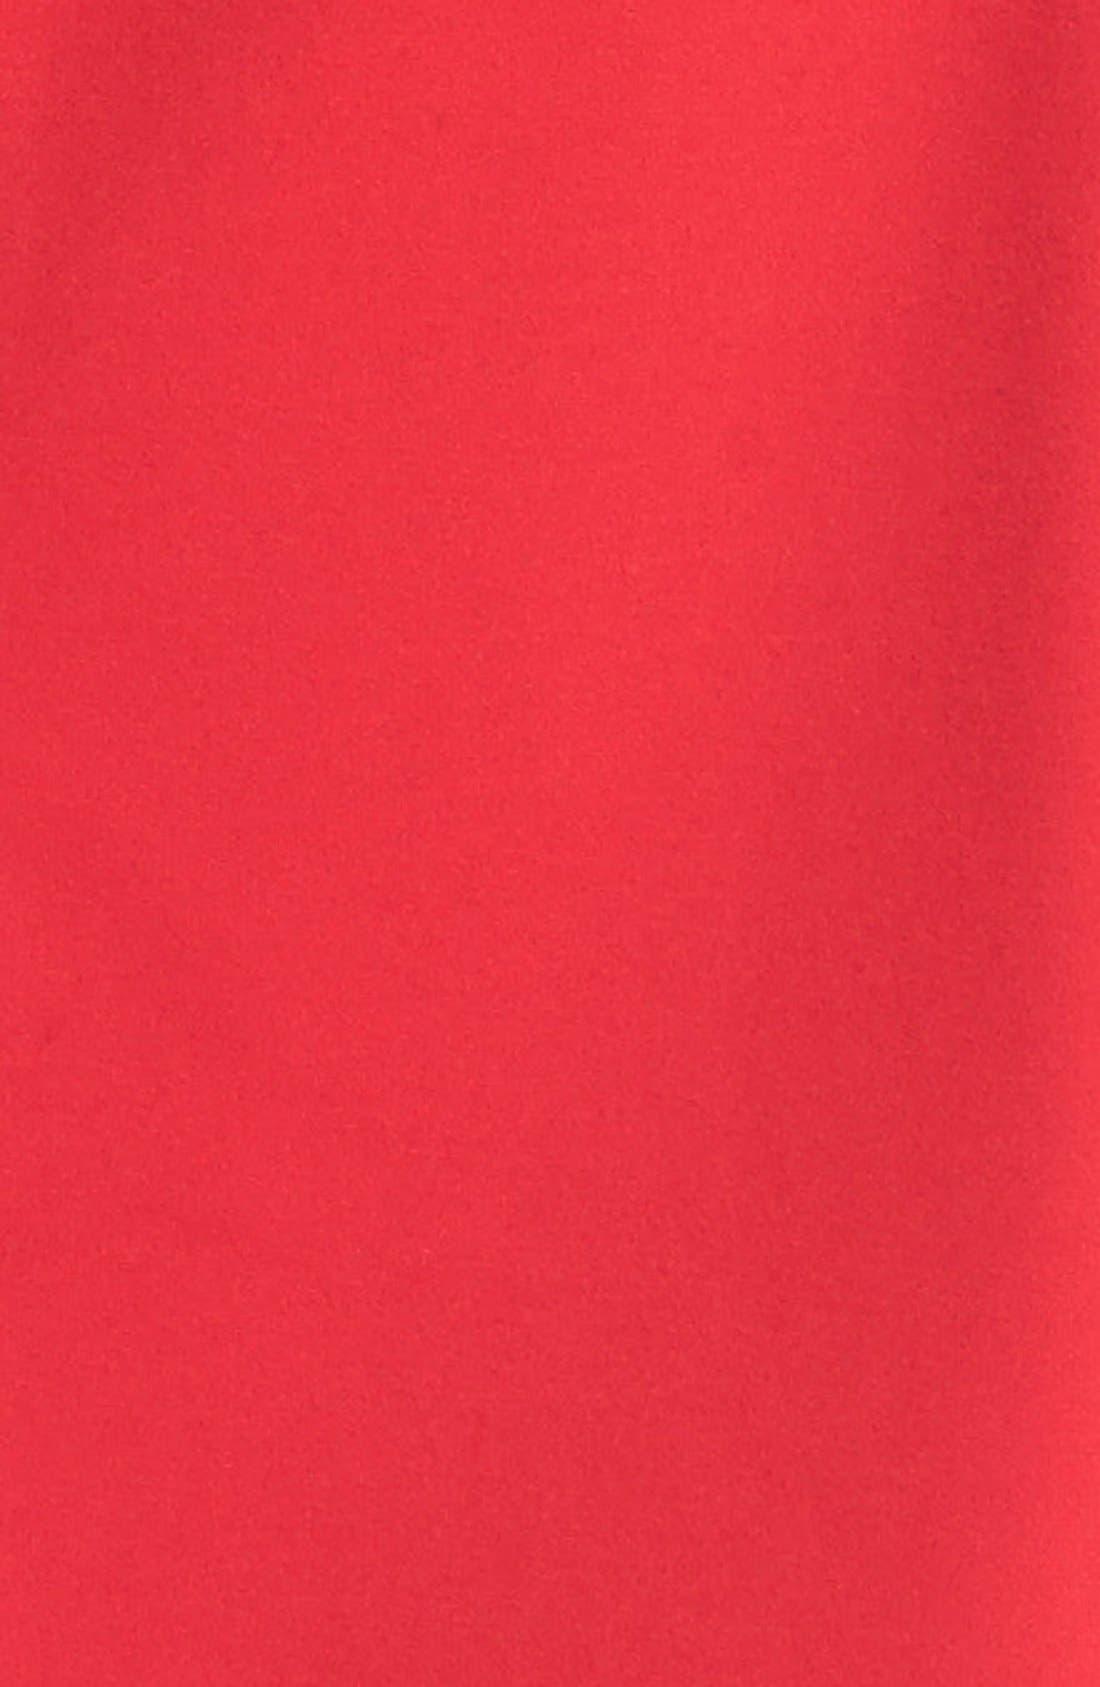 Alternate Image 2  - Calvin Klein Faux Leather Trim Ponte Sheath Dress (Petite)